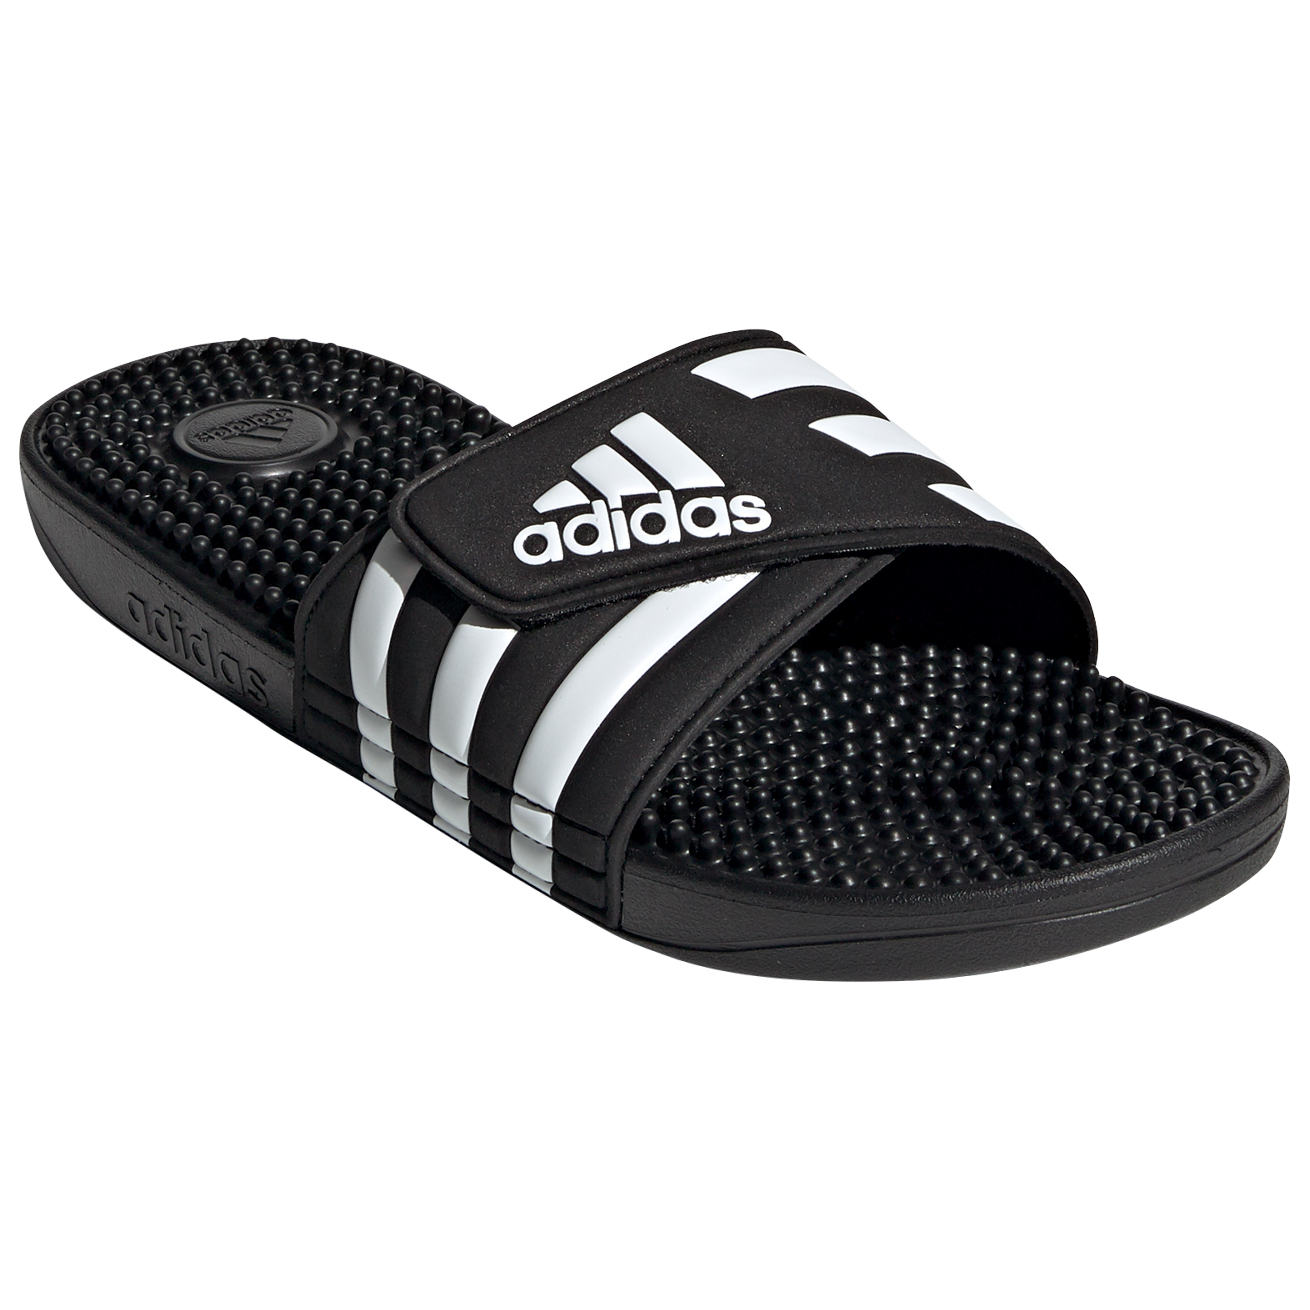 reputable site 219ea efe4b Adidas Adissage - Sandalen Heren online kopen  Bergfreunde.n